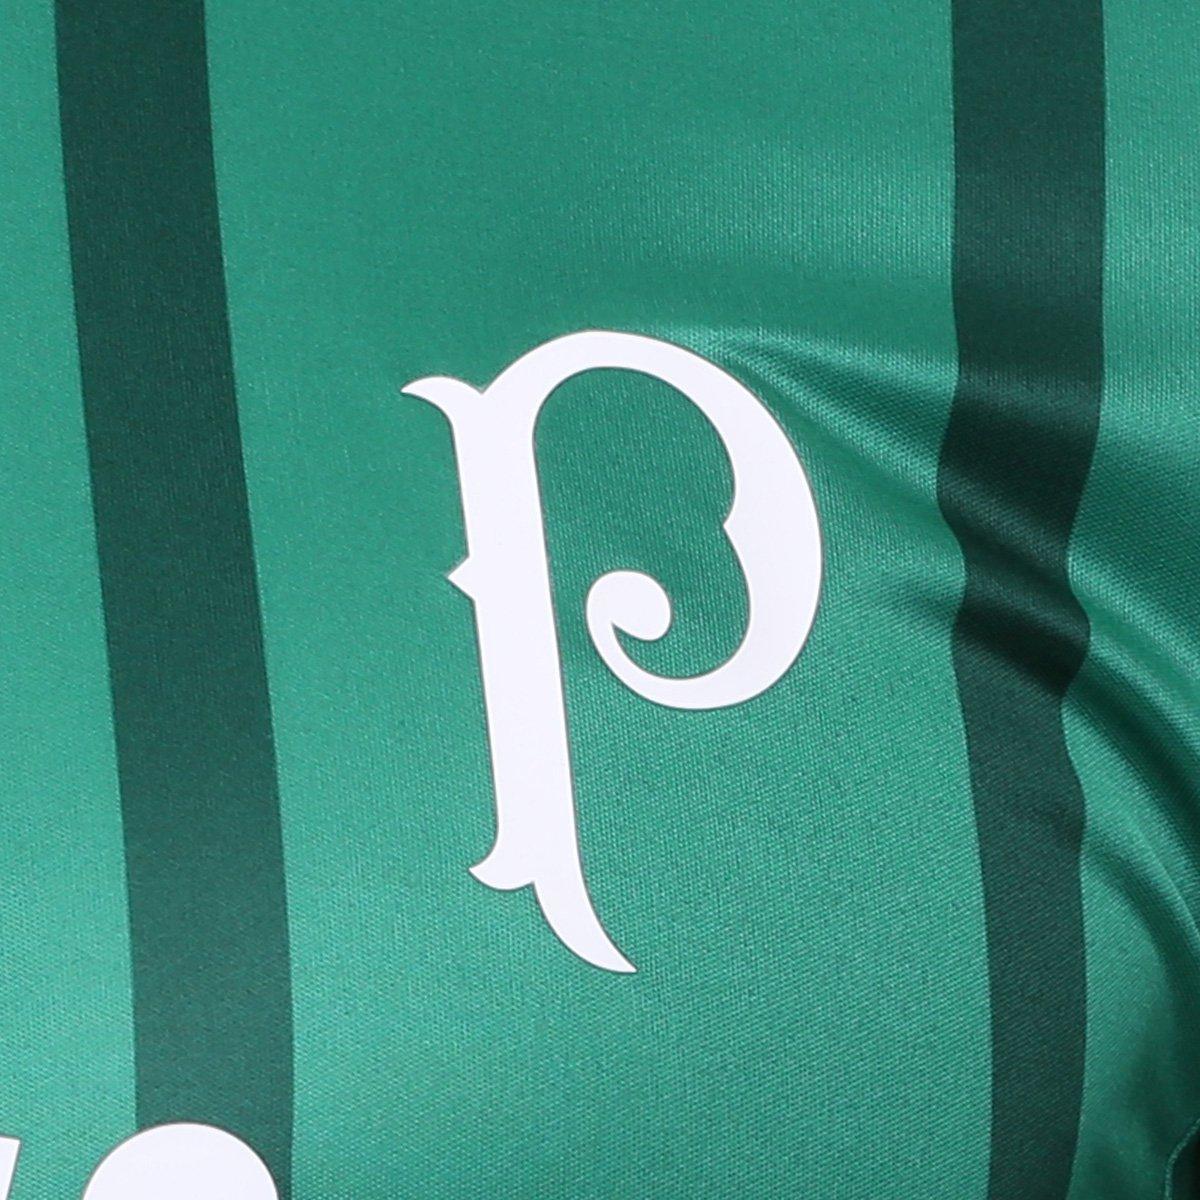 a2a9175c5 Camisa Palmeiras I s/n° 17/18 - Jogador Adidas Masculina - Tam: GG ...